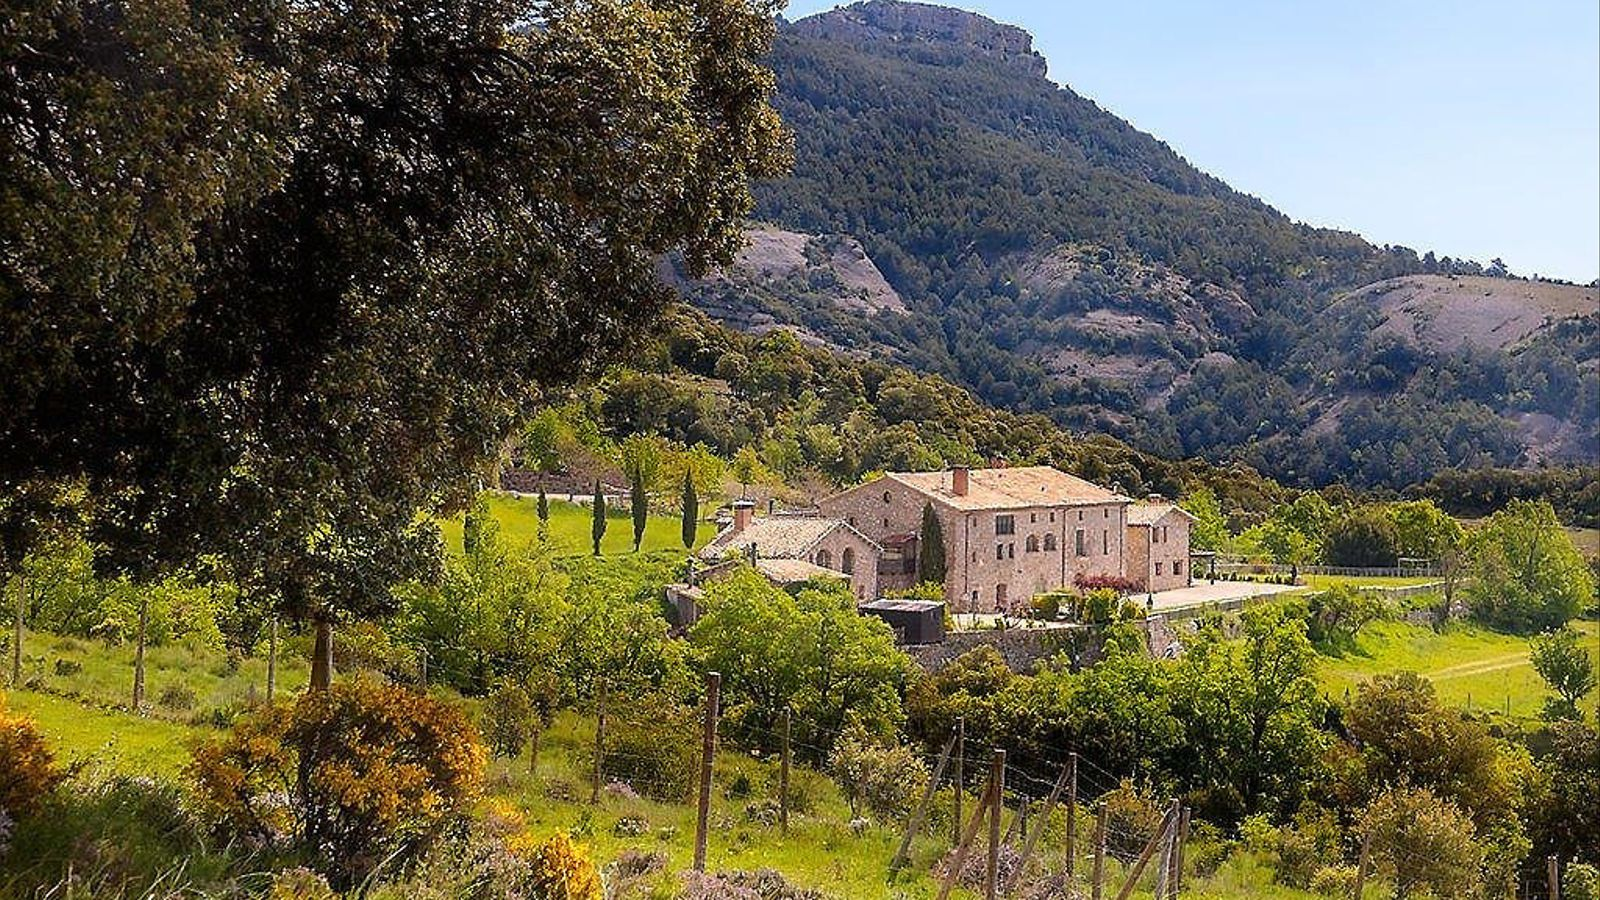 Un país per confinar-s'hi Poble Puig Arnau-Pubilló Millor que una  casa rural:  un 'poble' rural!